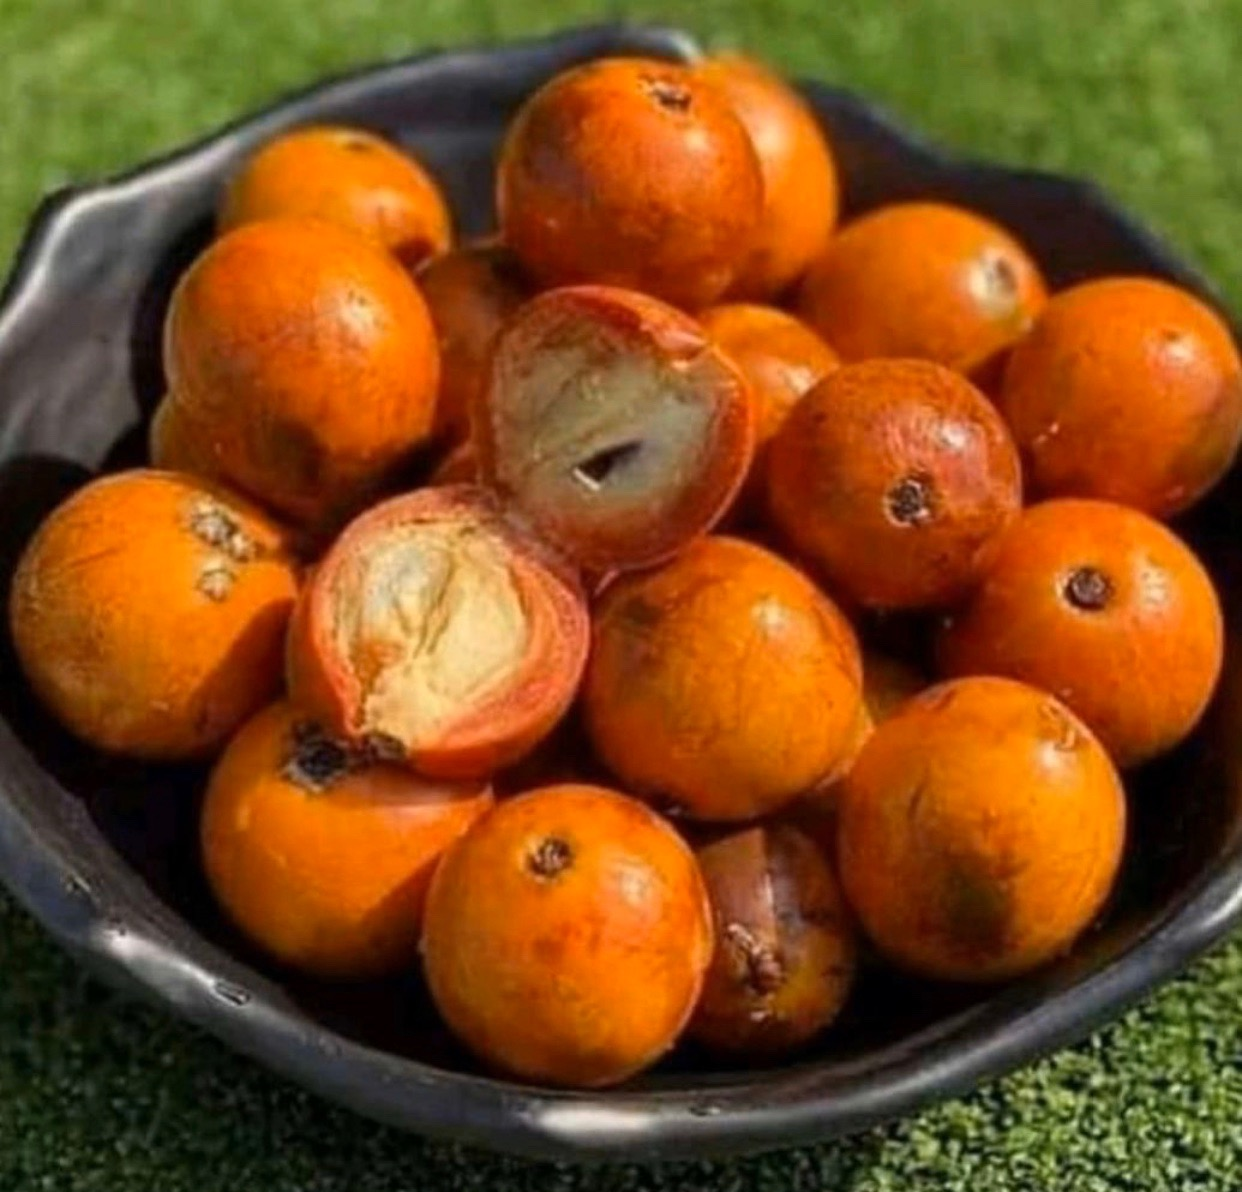 #cookingrecipehq   agbalumo fruit  -rich in vitamin c😛